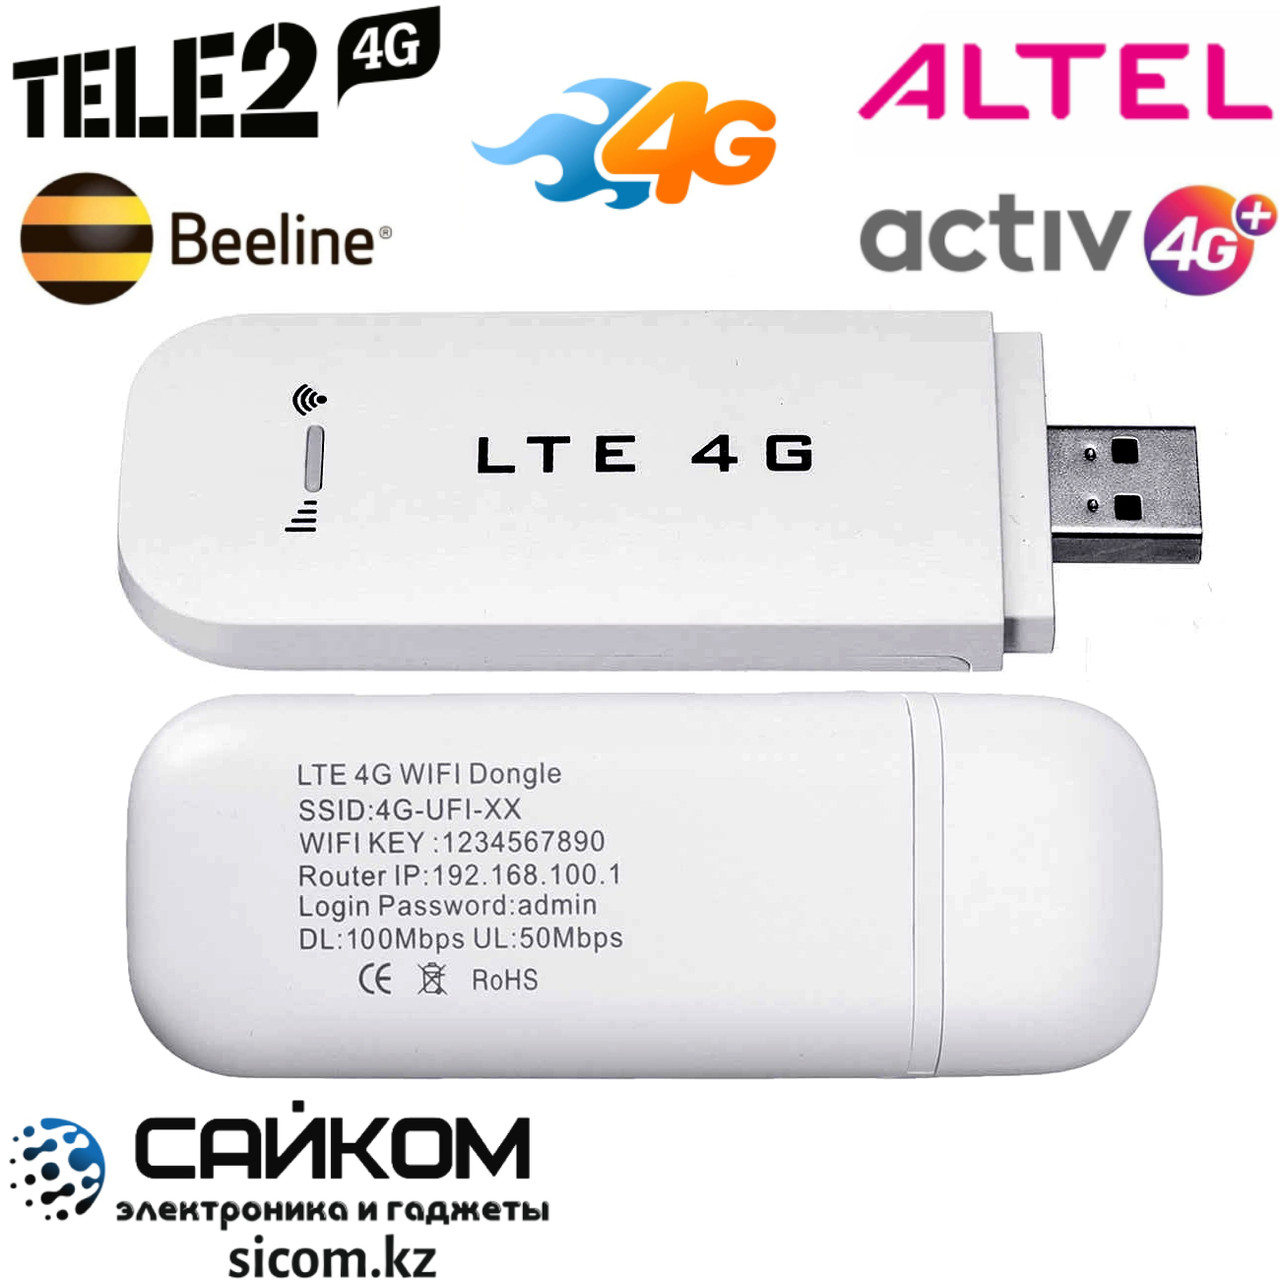 4G USB Wi-Fi Wireless Модем Altel, Tele 2, Activ, Beeline / 150 Мбит/с - фото 1